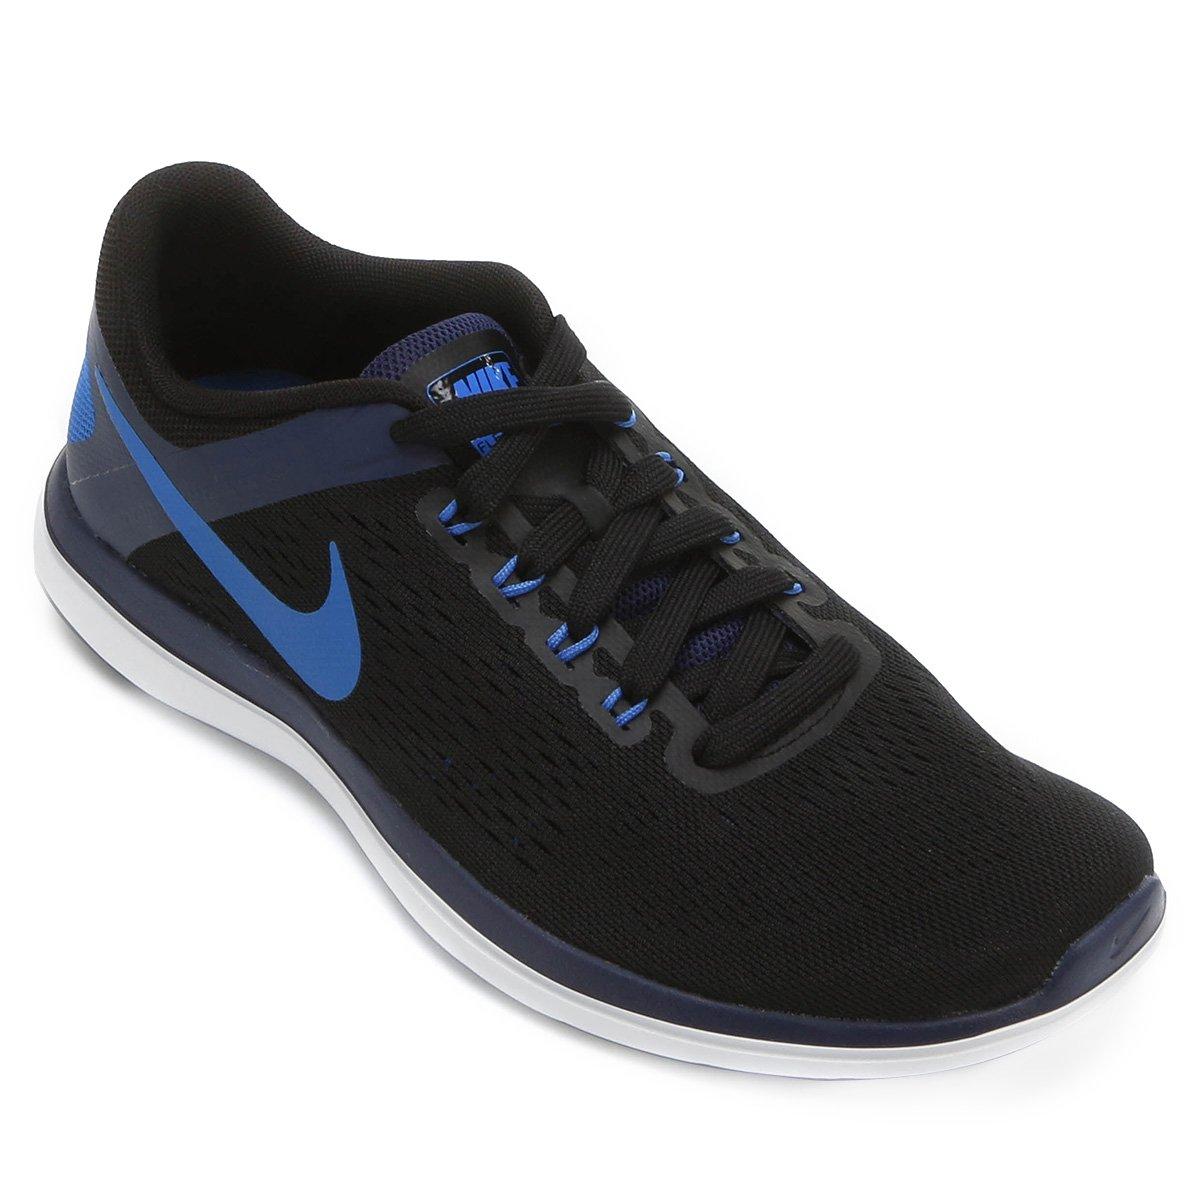 Tênis Nike Flex 2016 RN Masculino - Compre Agora  877dba209f212